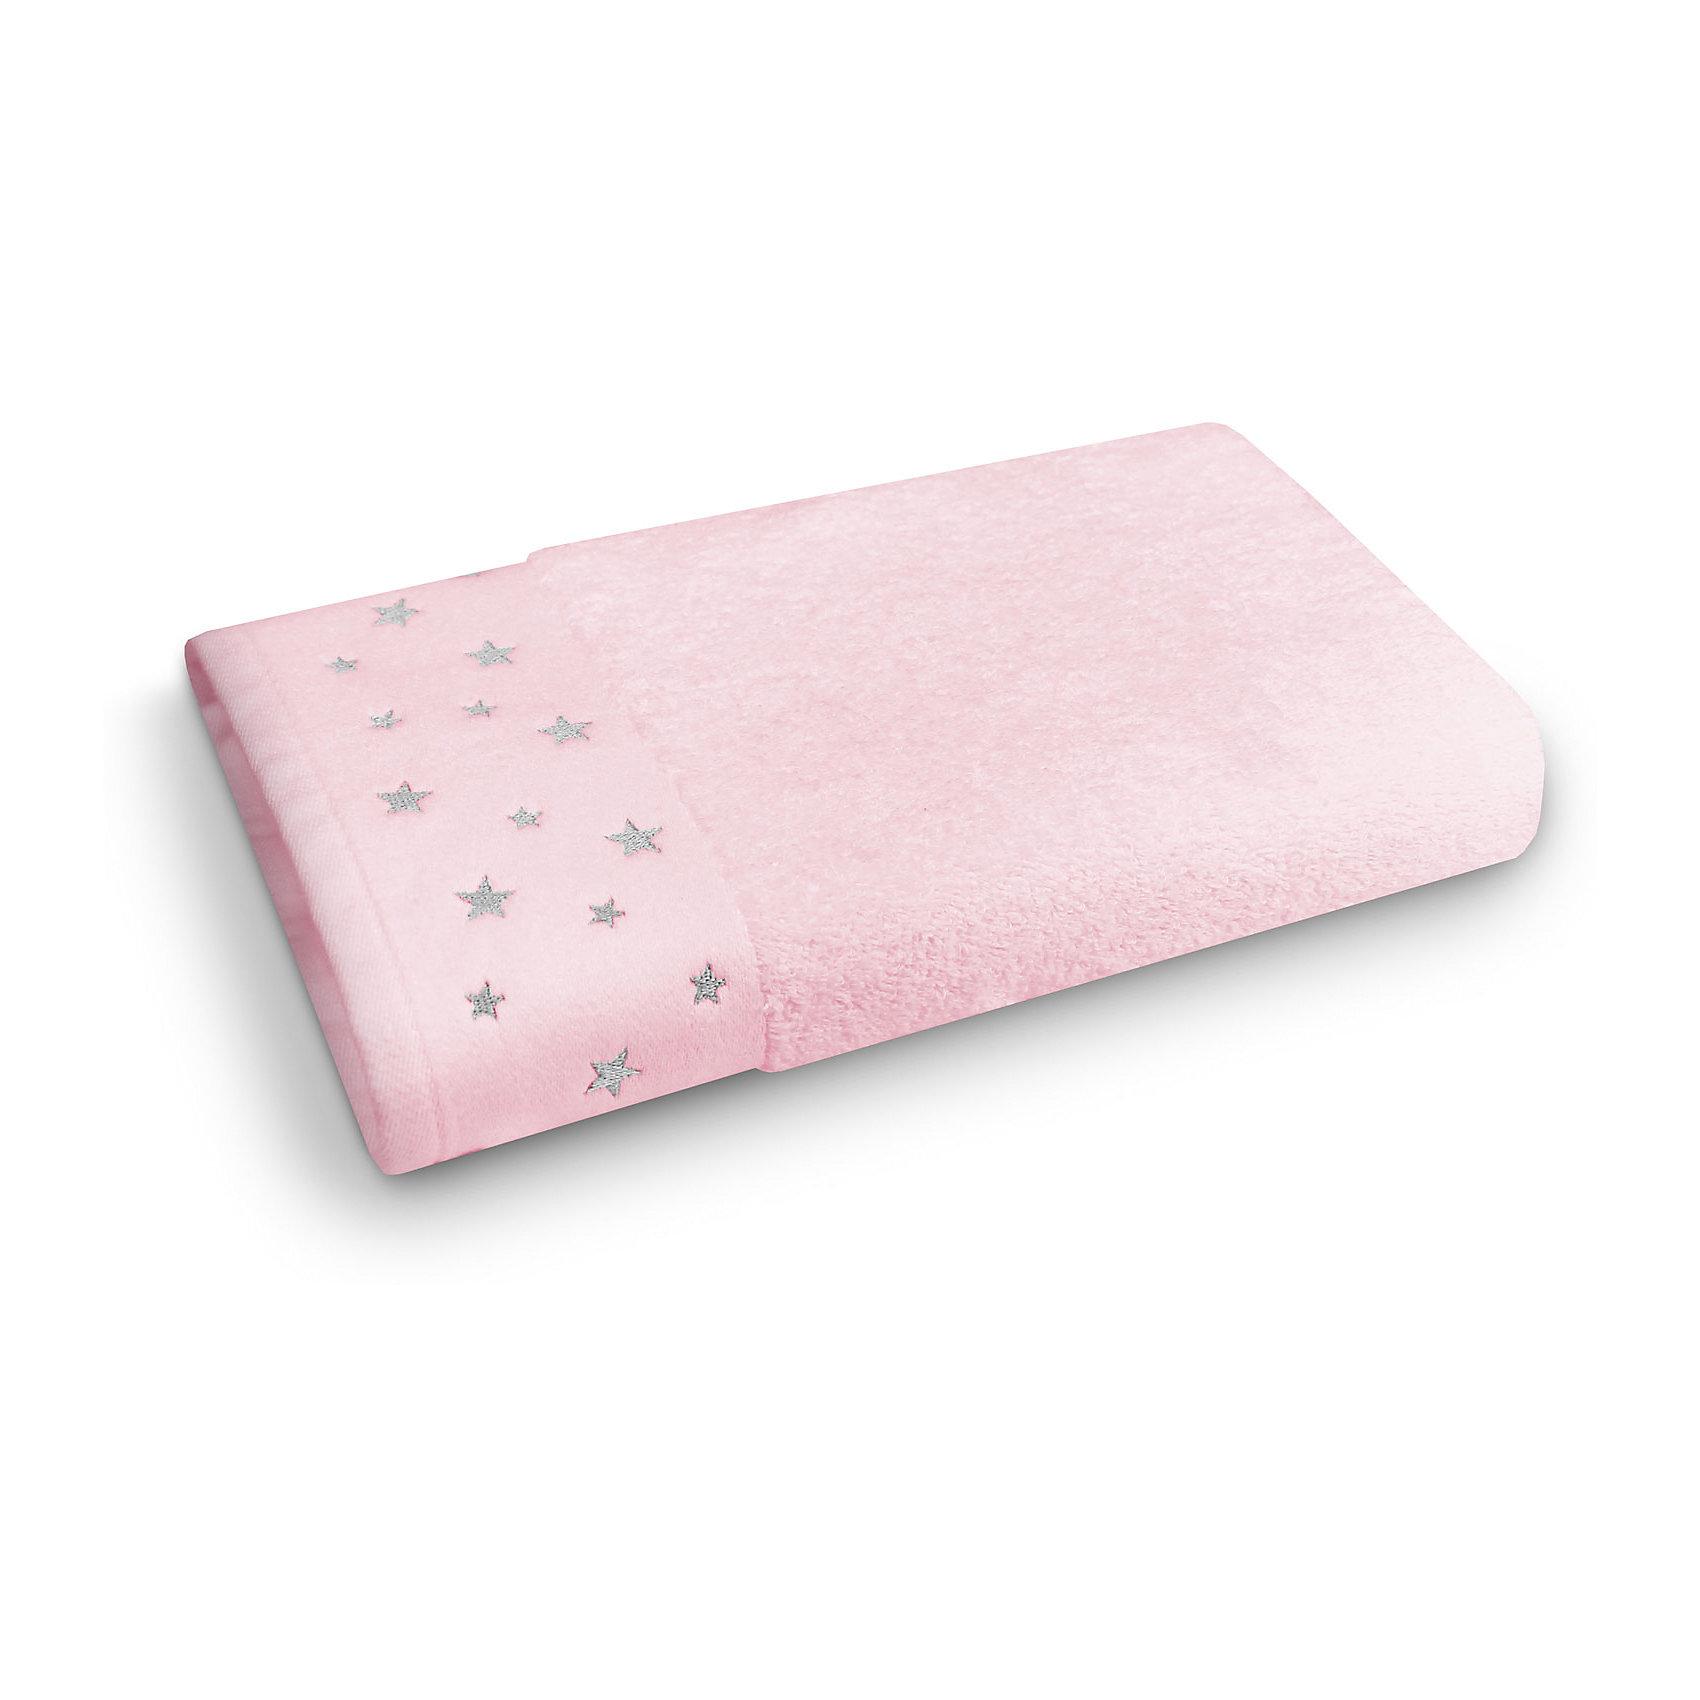 Полотенце махровое 50*90 Звездопад, Cozy Home, розовый